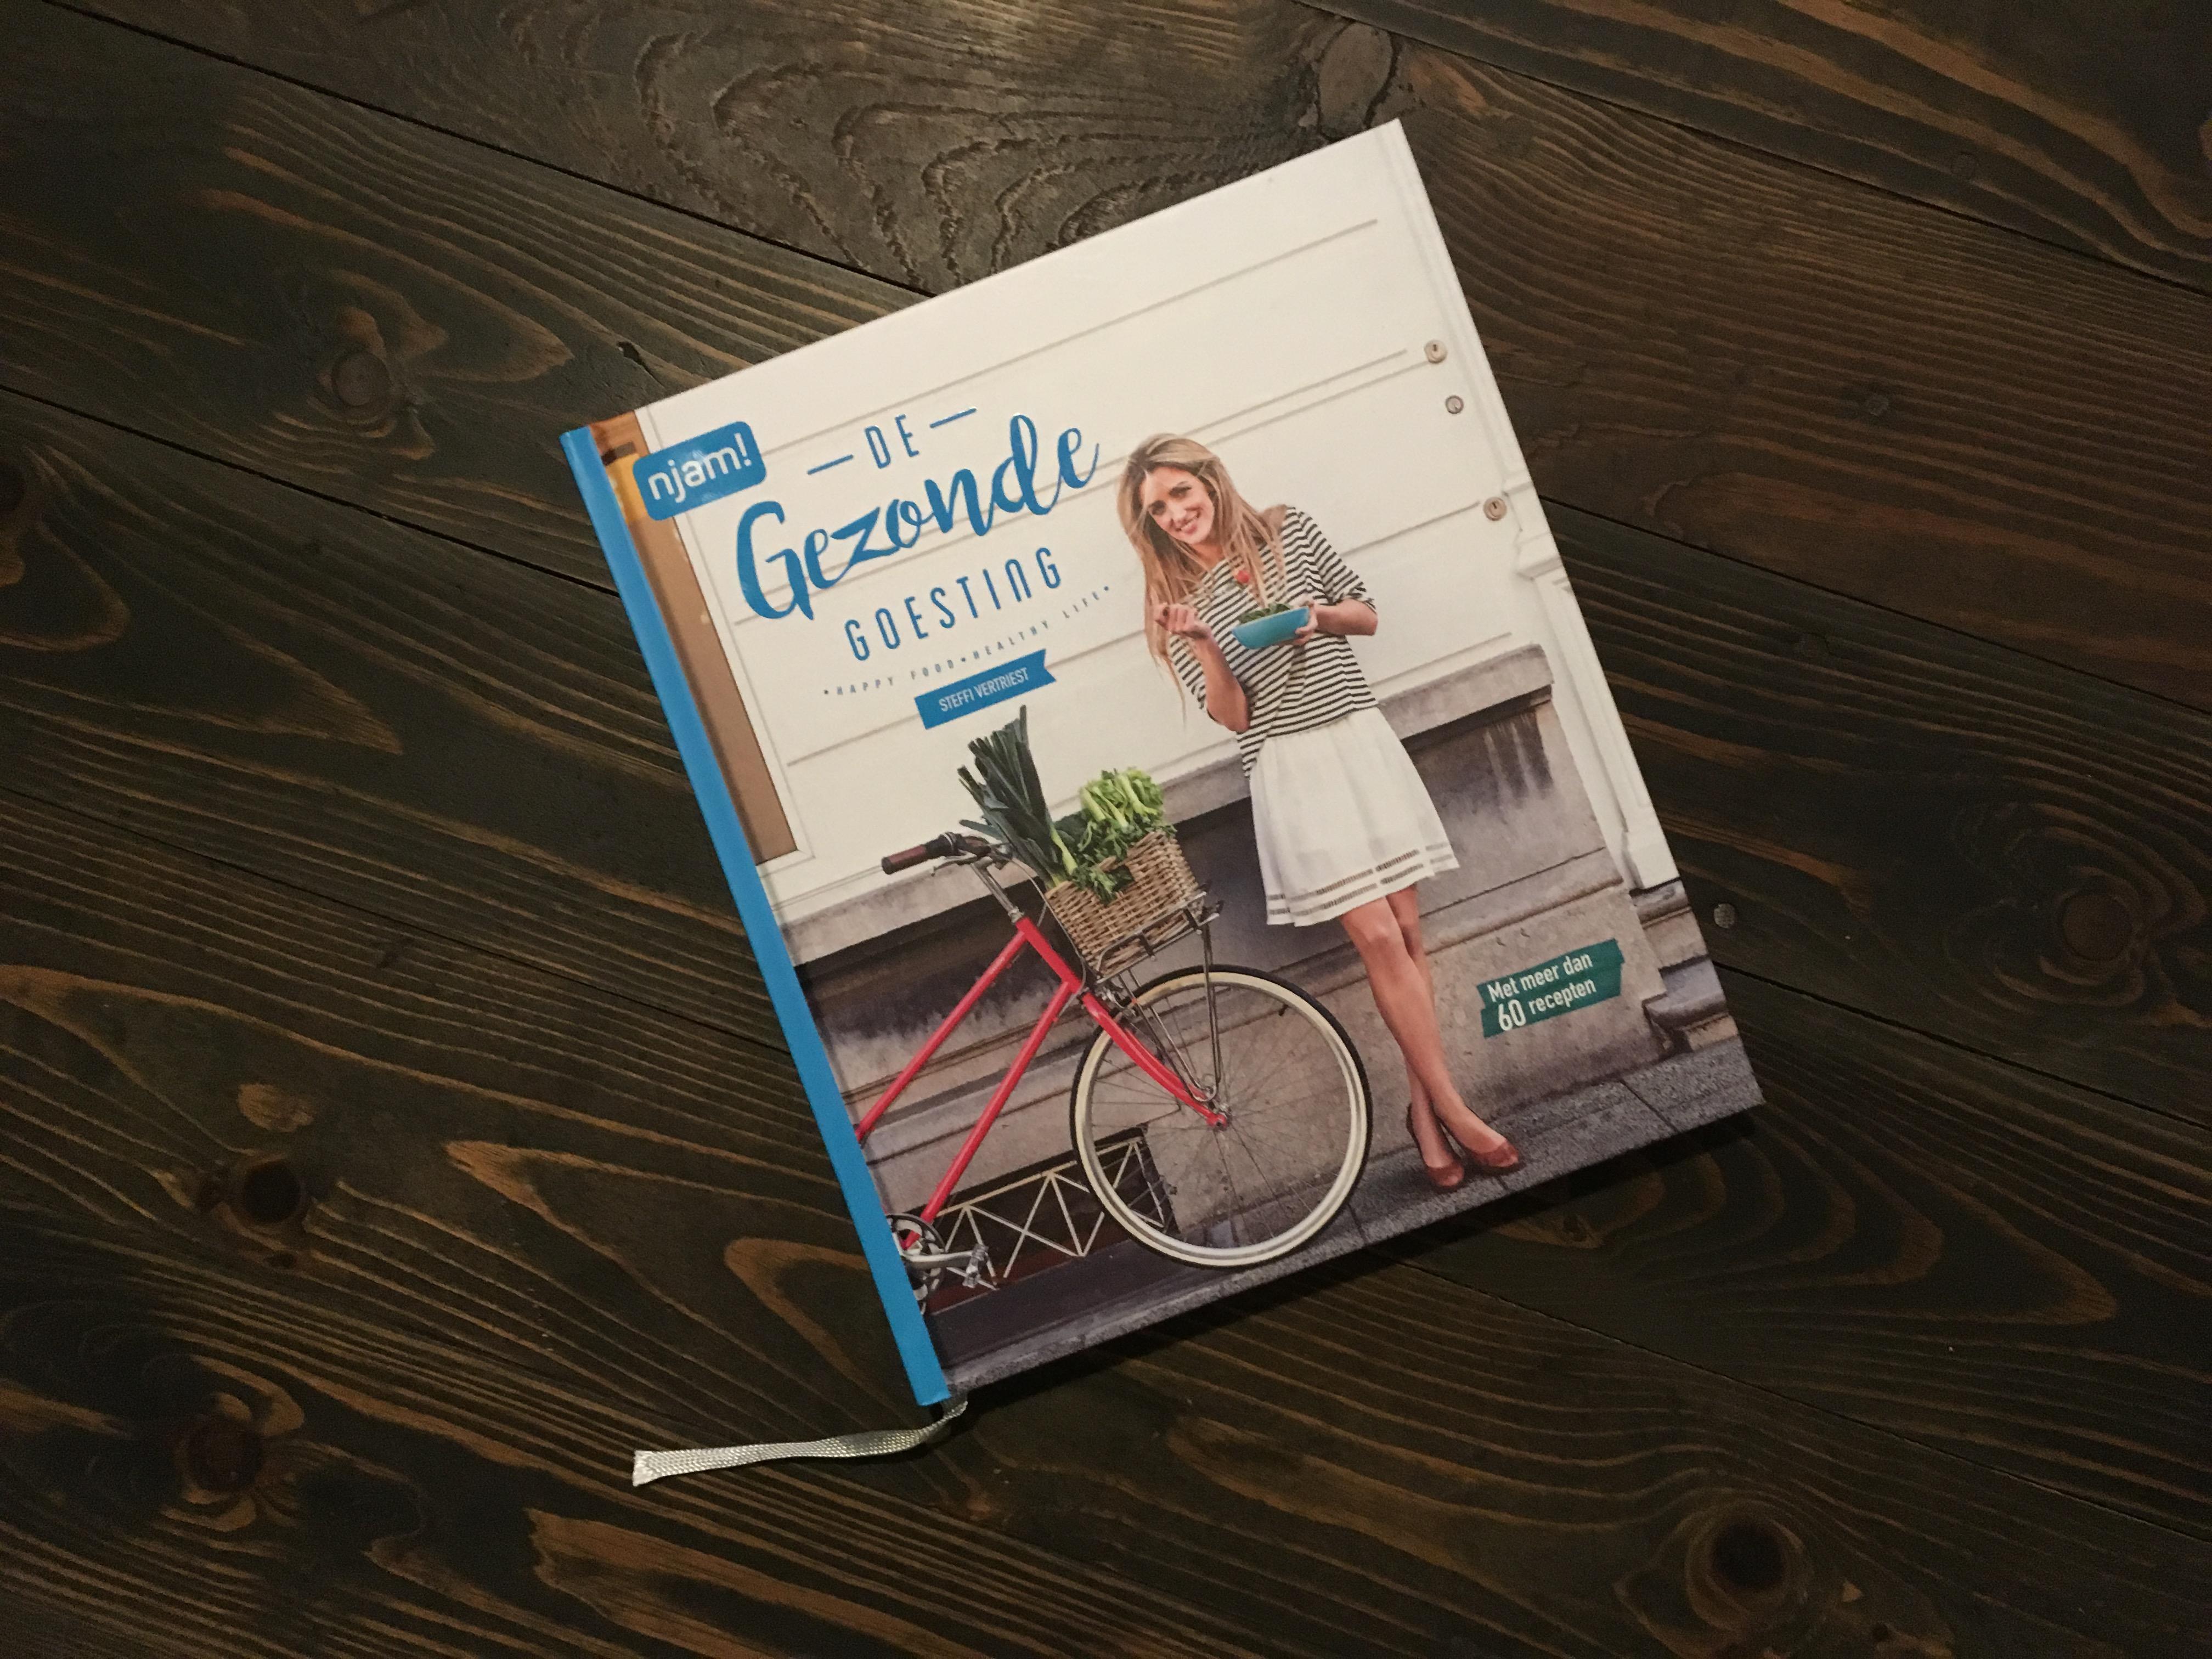 #kookboekweek De gezonde goesting | Julienne